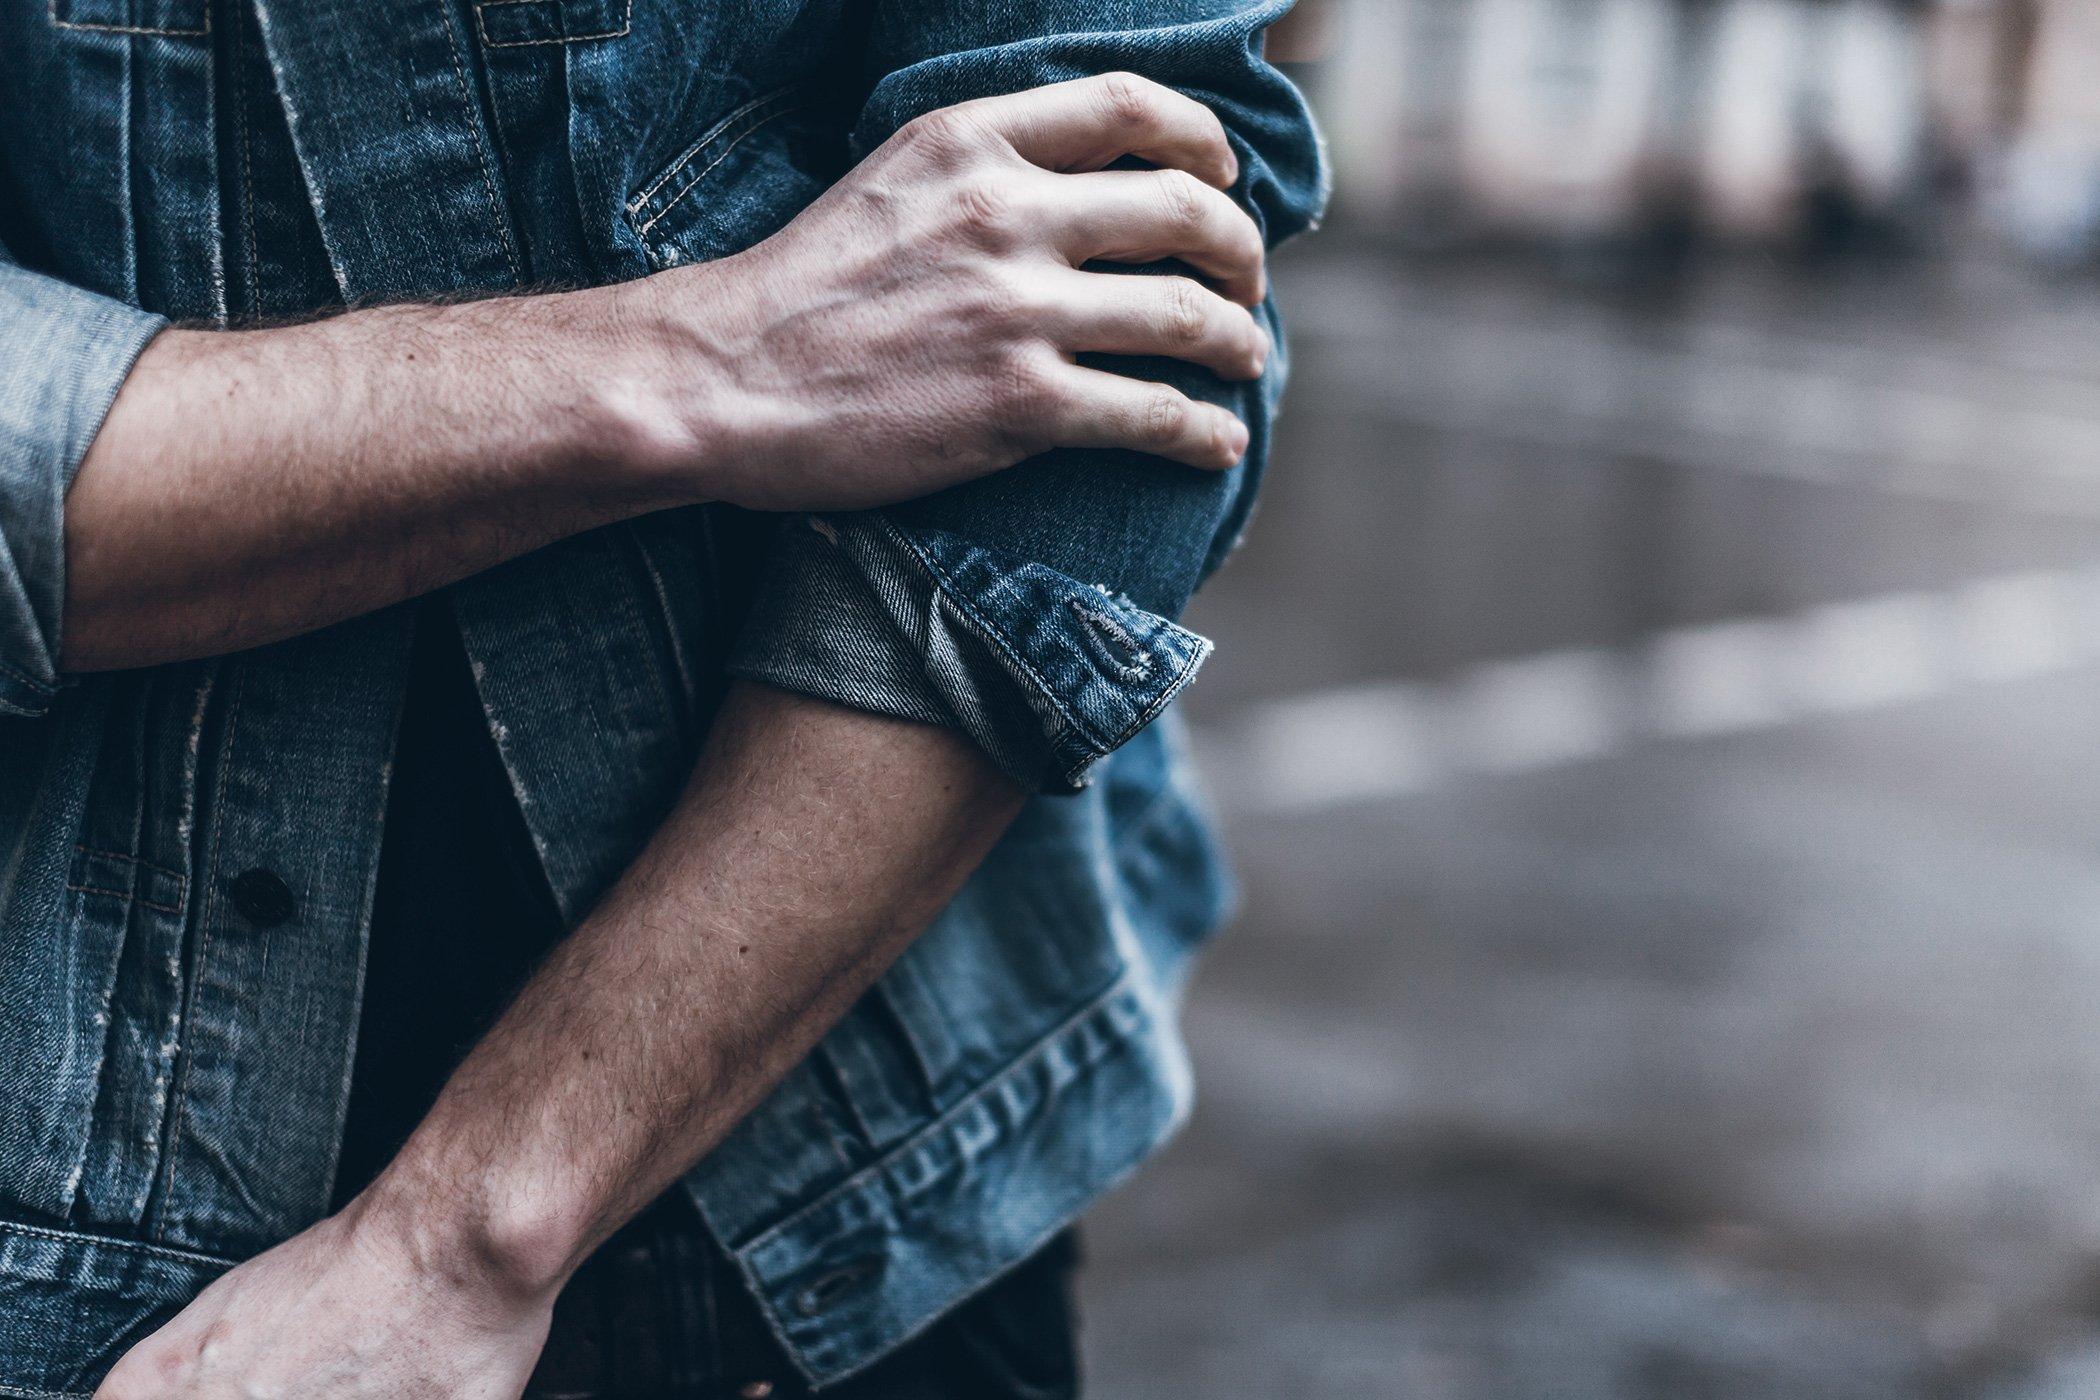 mikuta-klemens-citizens-of-humanity-jeans-jacket-4